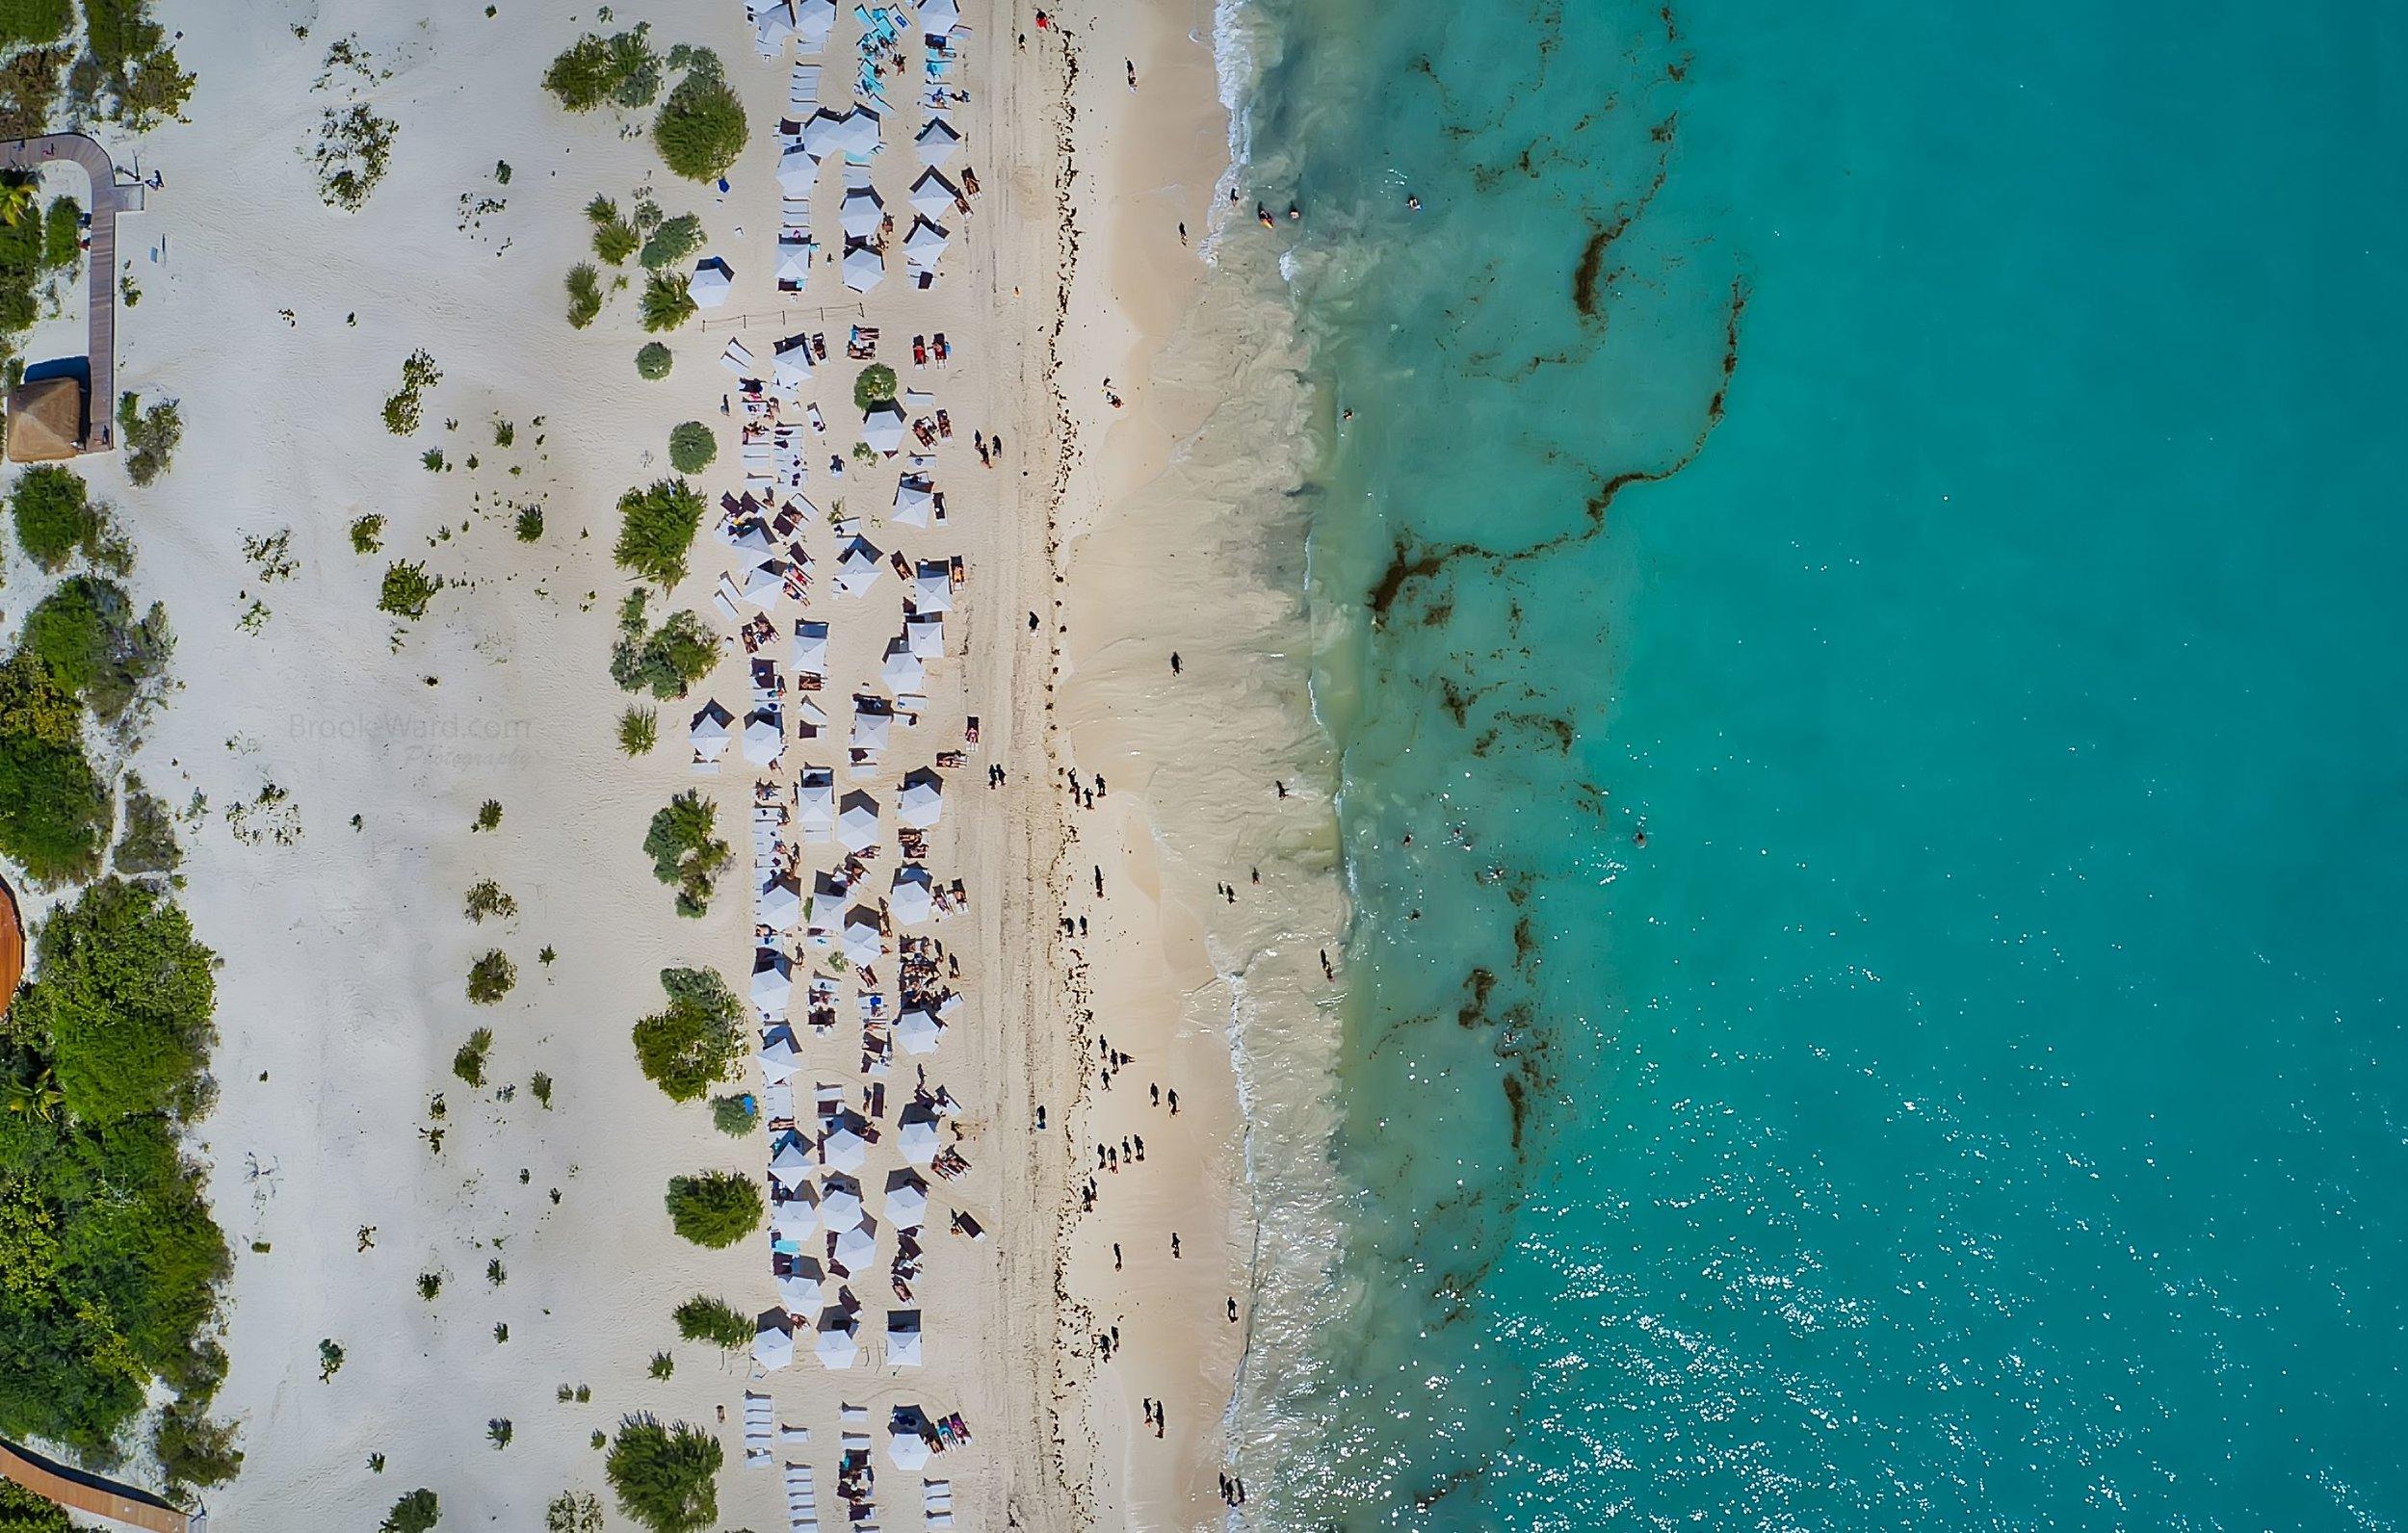 Cancun: edited with AirMagic